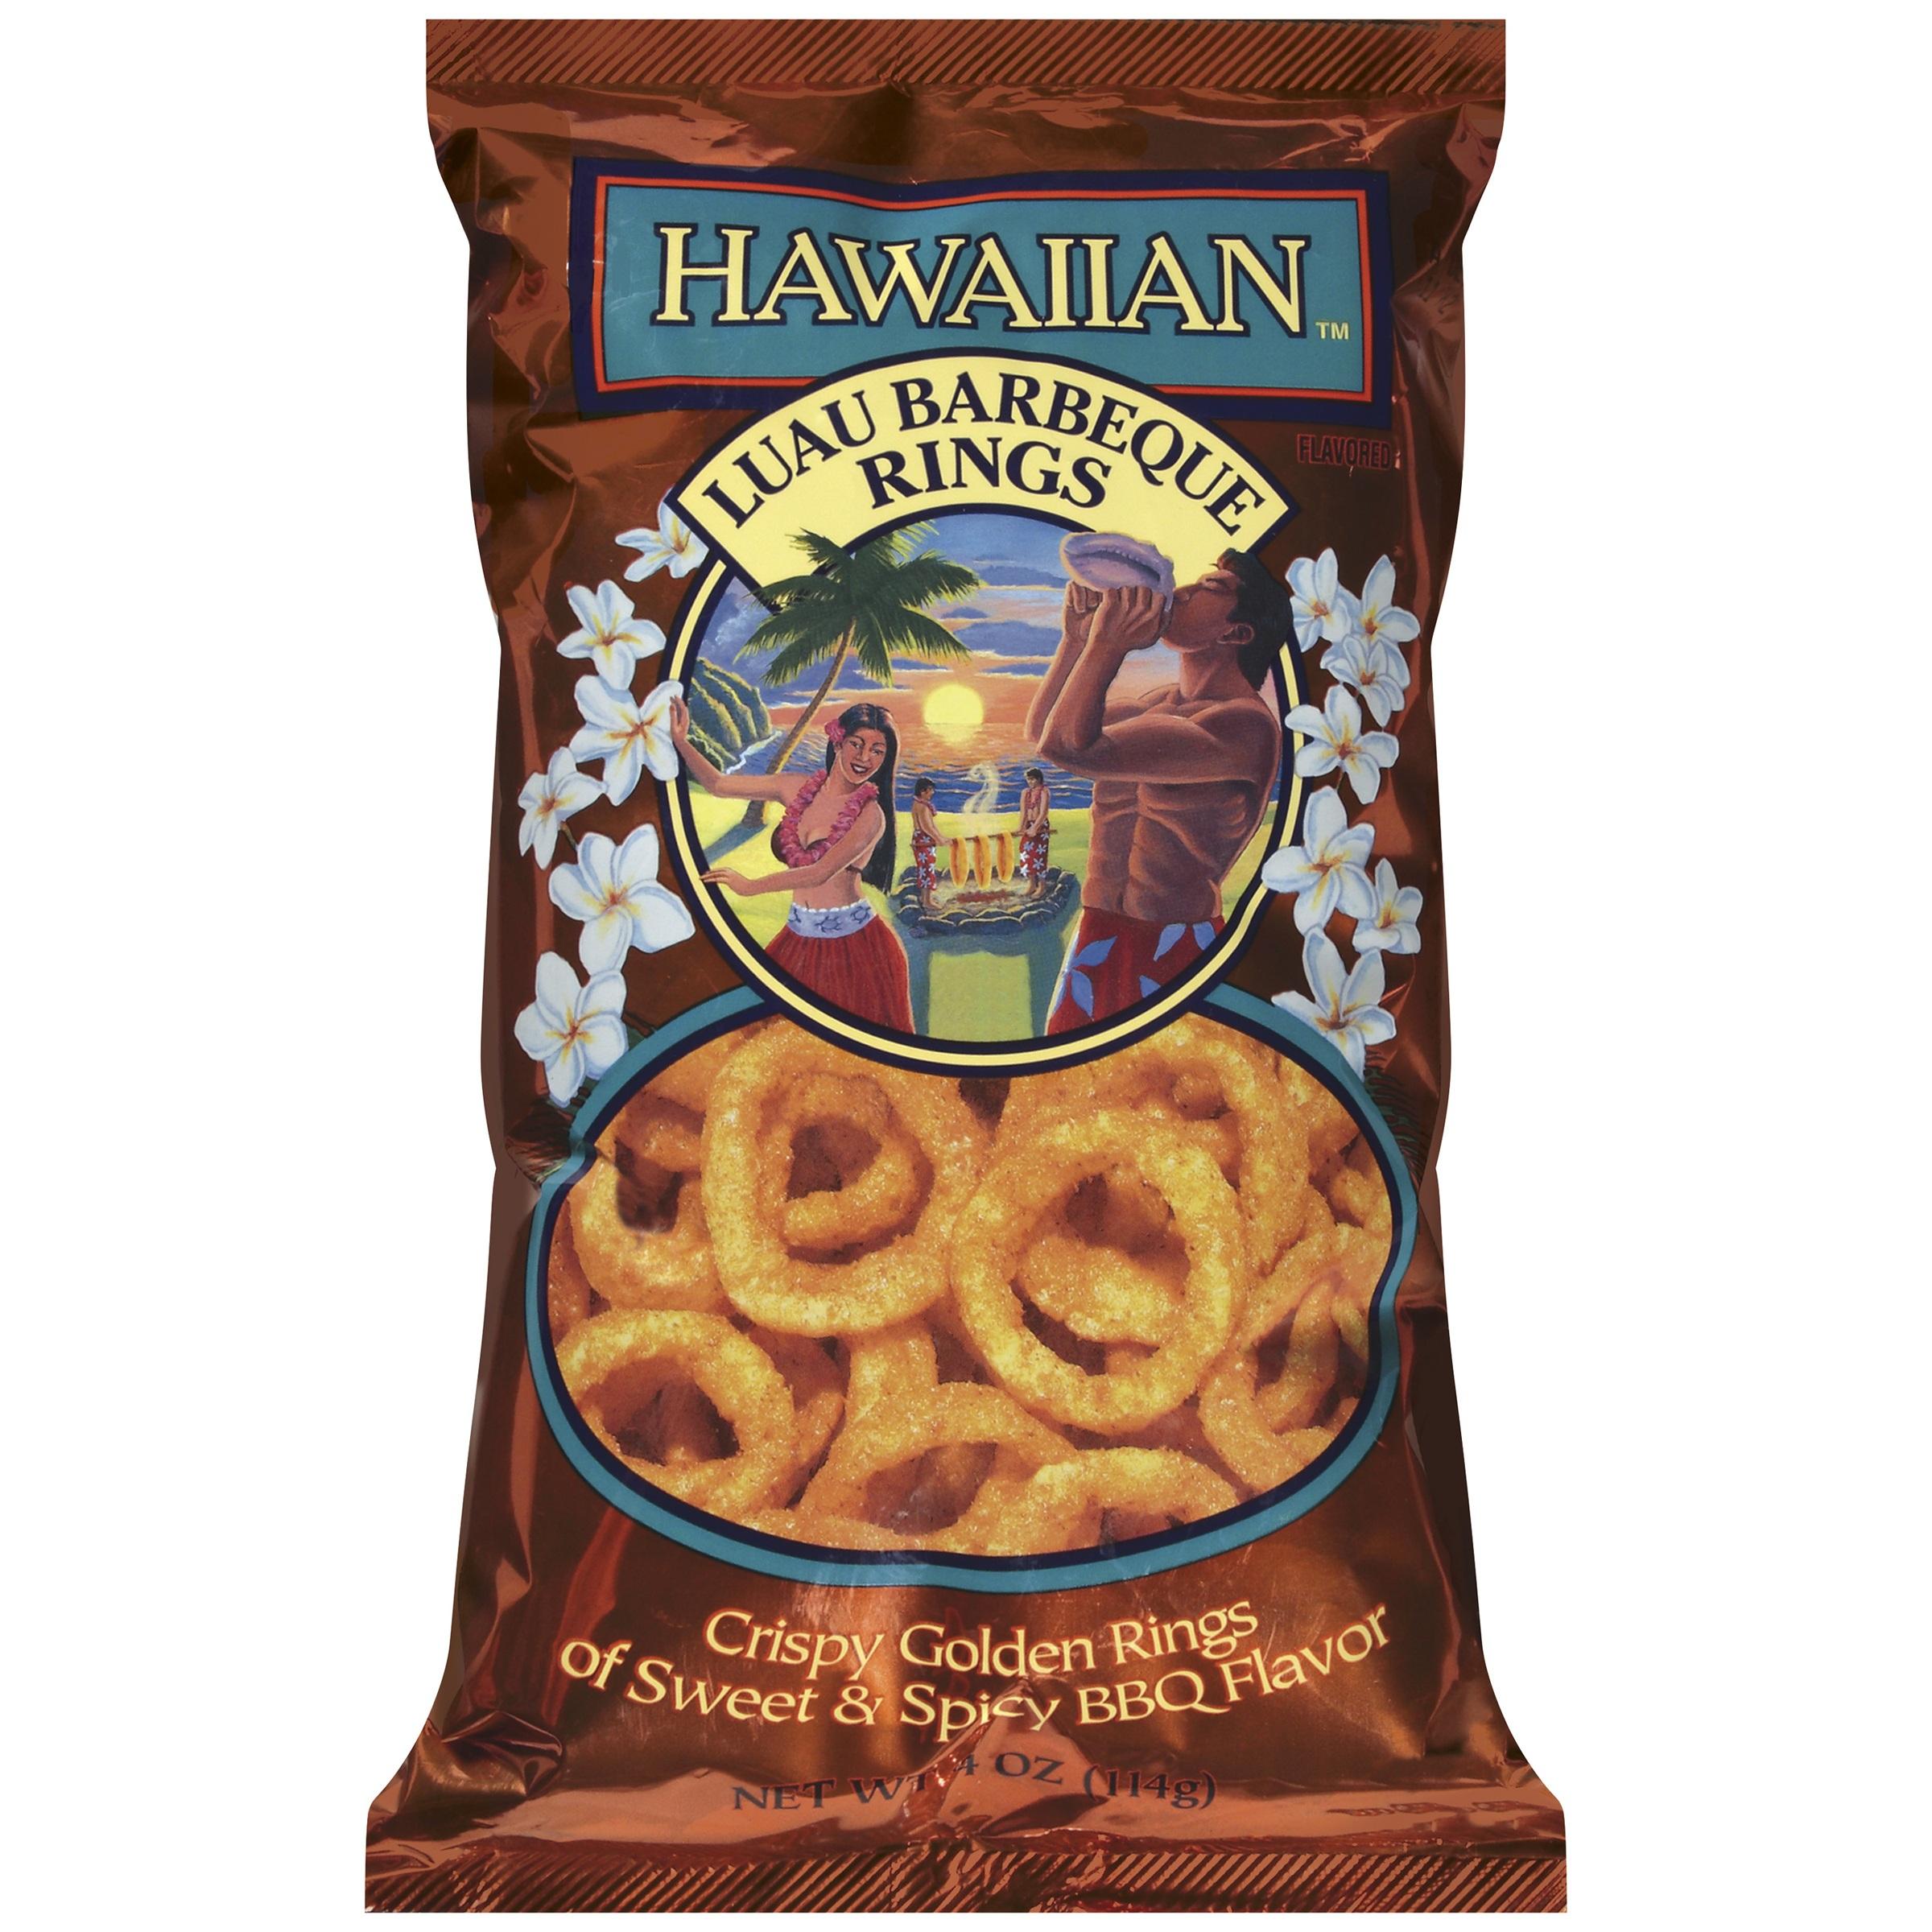 HAWAIIAN™ KETTLE STYLE POTATO CHIPS Luau Barbeque Rings 4 OZ BAG